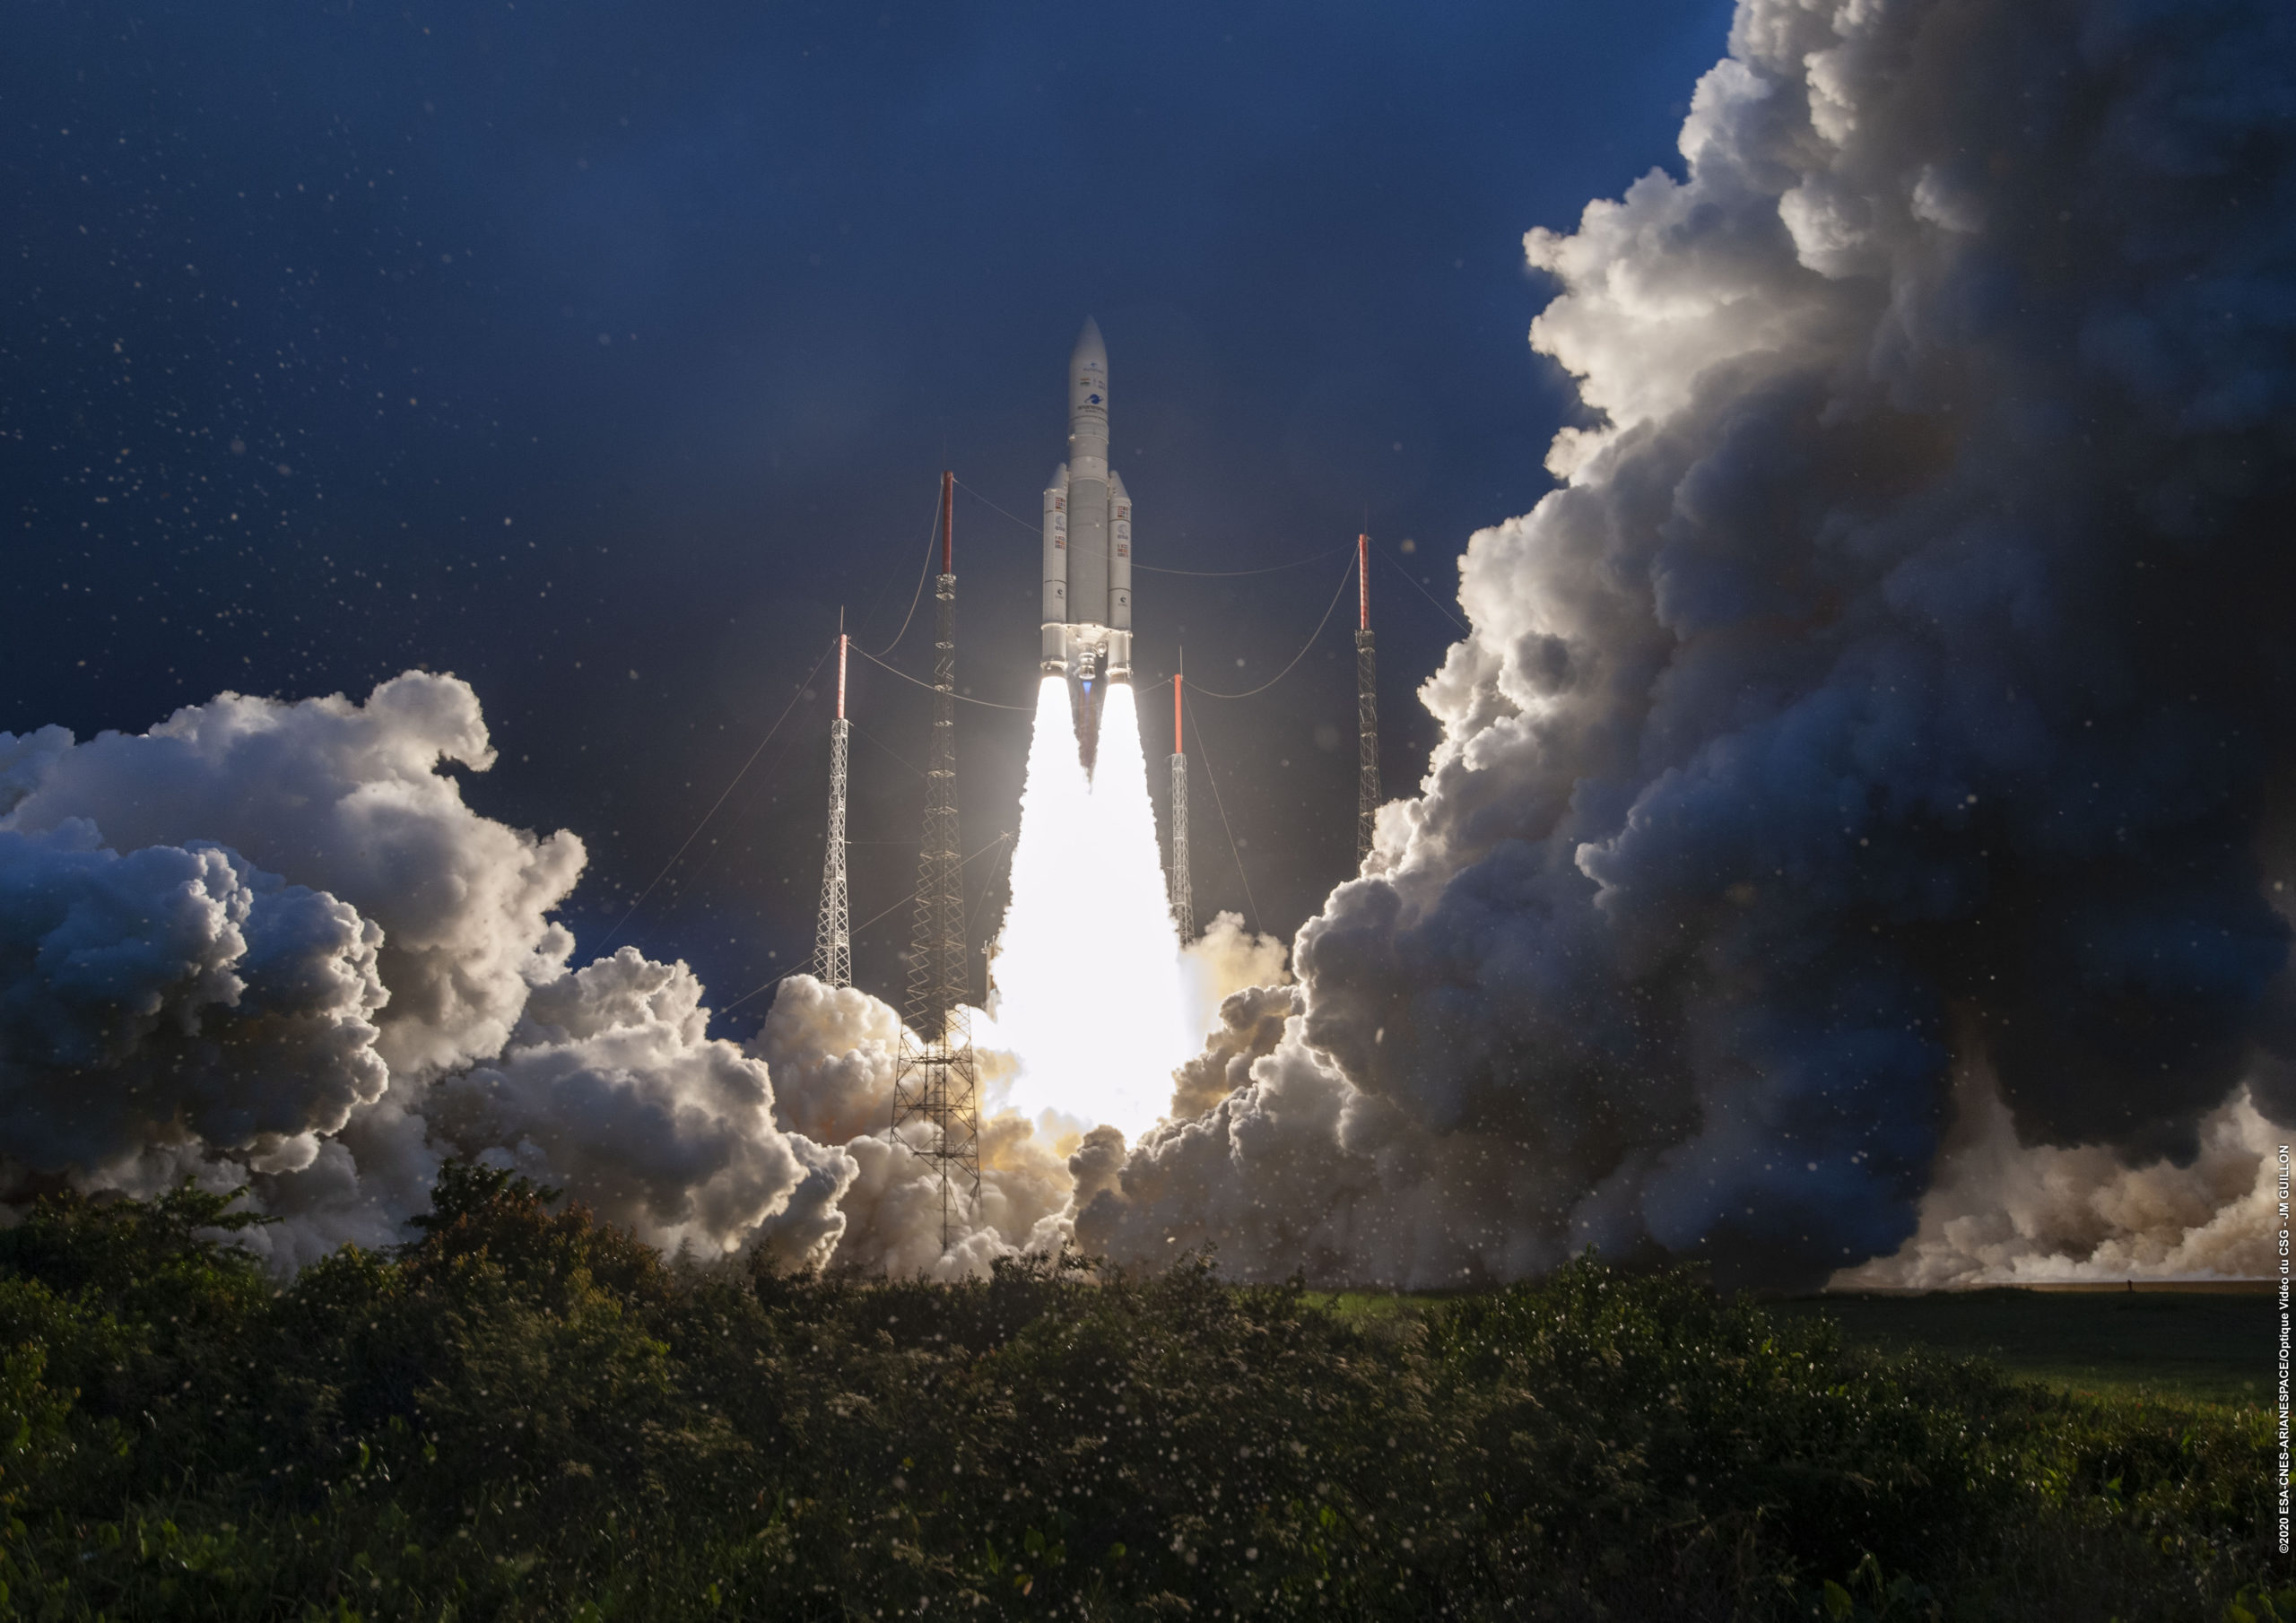 (c) ESA, CNES, Arianespace. Several Norwegian companies contribute to the Ariane launcher program,